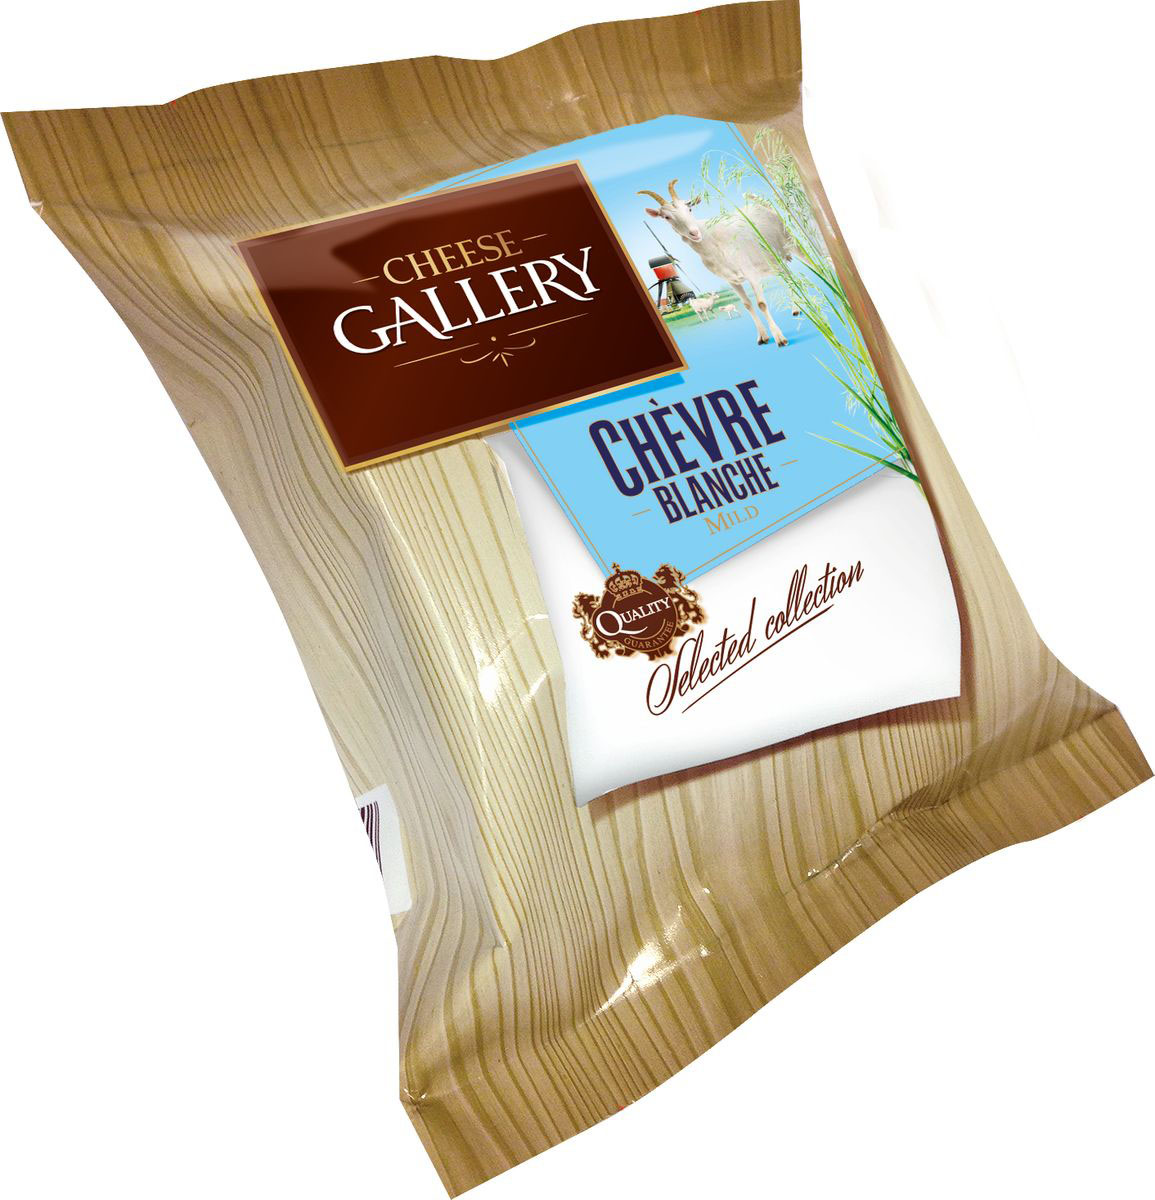 Cheese Gallery Сыр Козий, 50%, 175 г сыр